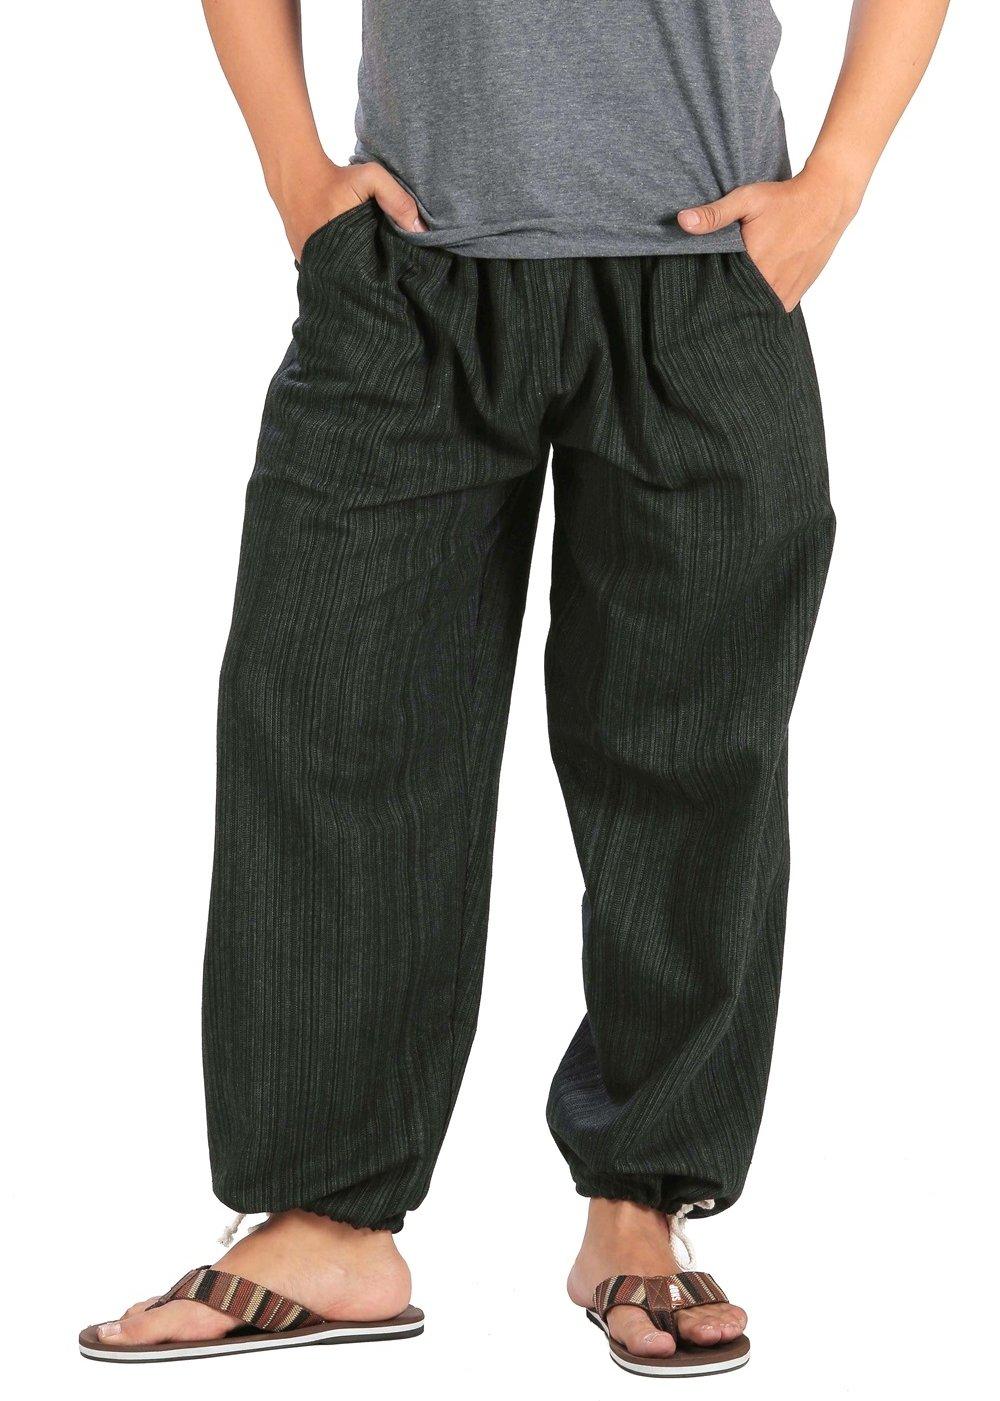 CandyHusky Pin Stripes Cotton Joggers Pajama Yoga Pants Elasticed Waist Drawstring (Black)